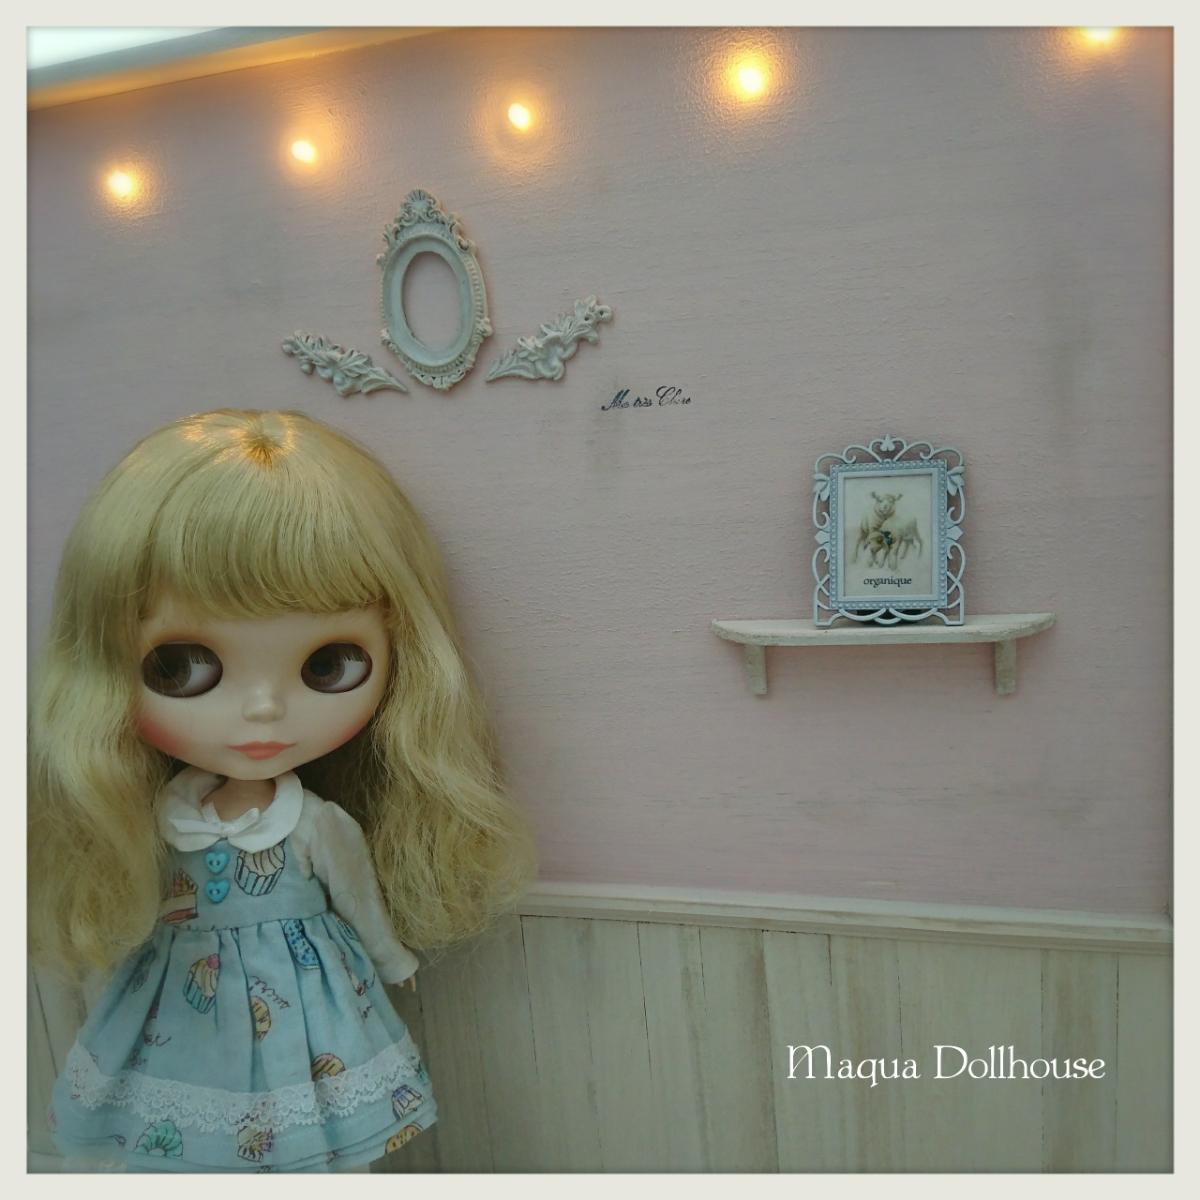 ●maqua*studio●いちごミルク色♪1/6*ドールハウス アンティーク風 ブライス momoko インテリア 飾り棚 ミニチュア シャビー 撮影背景